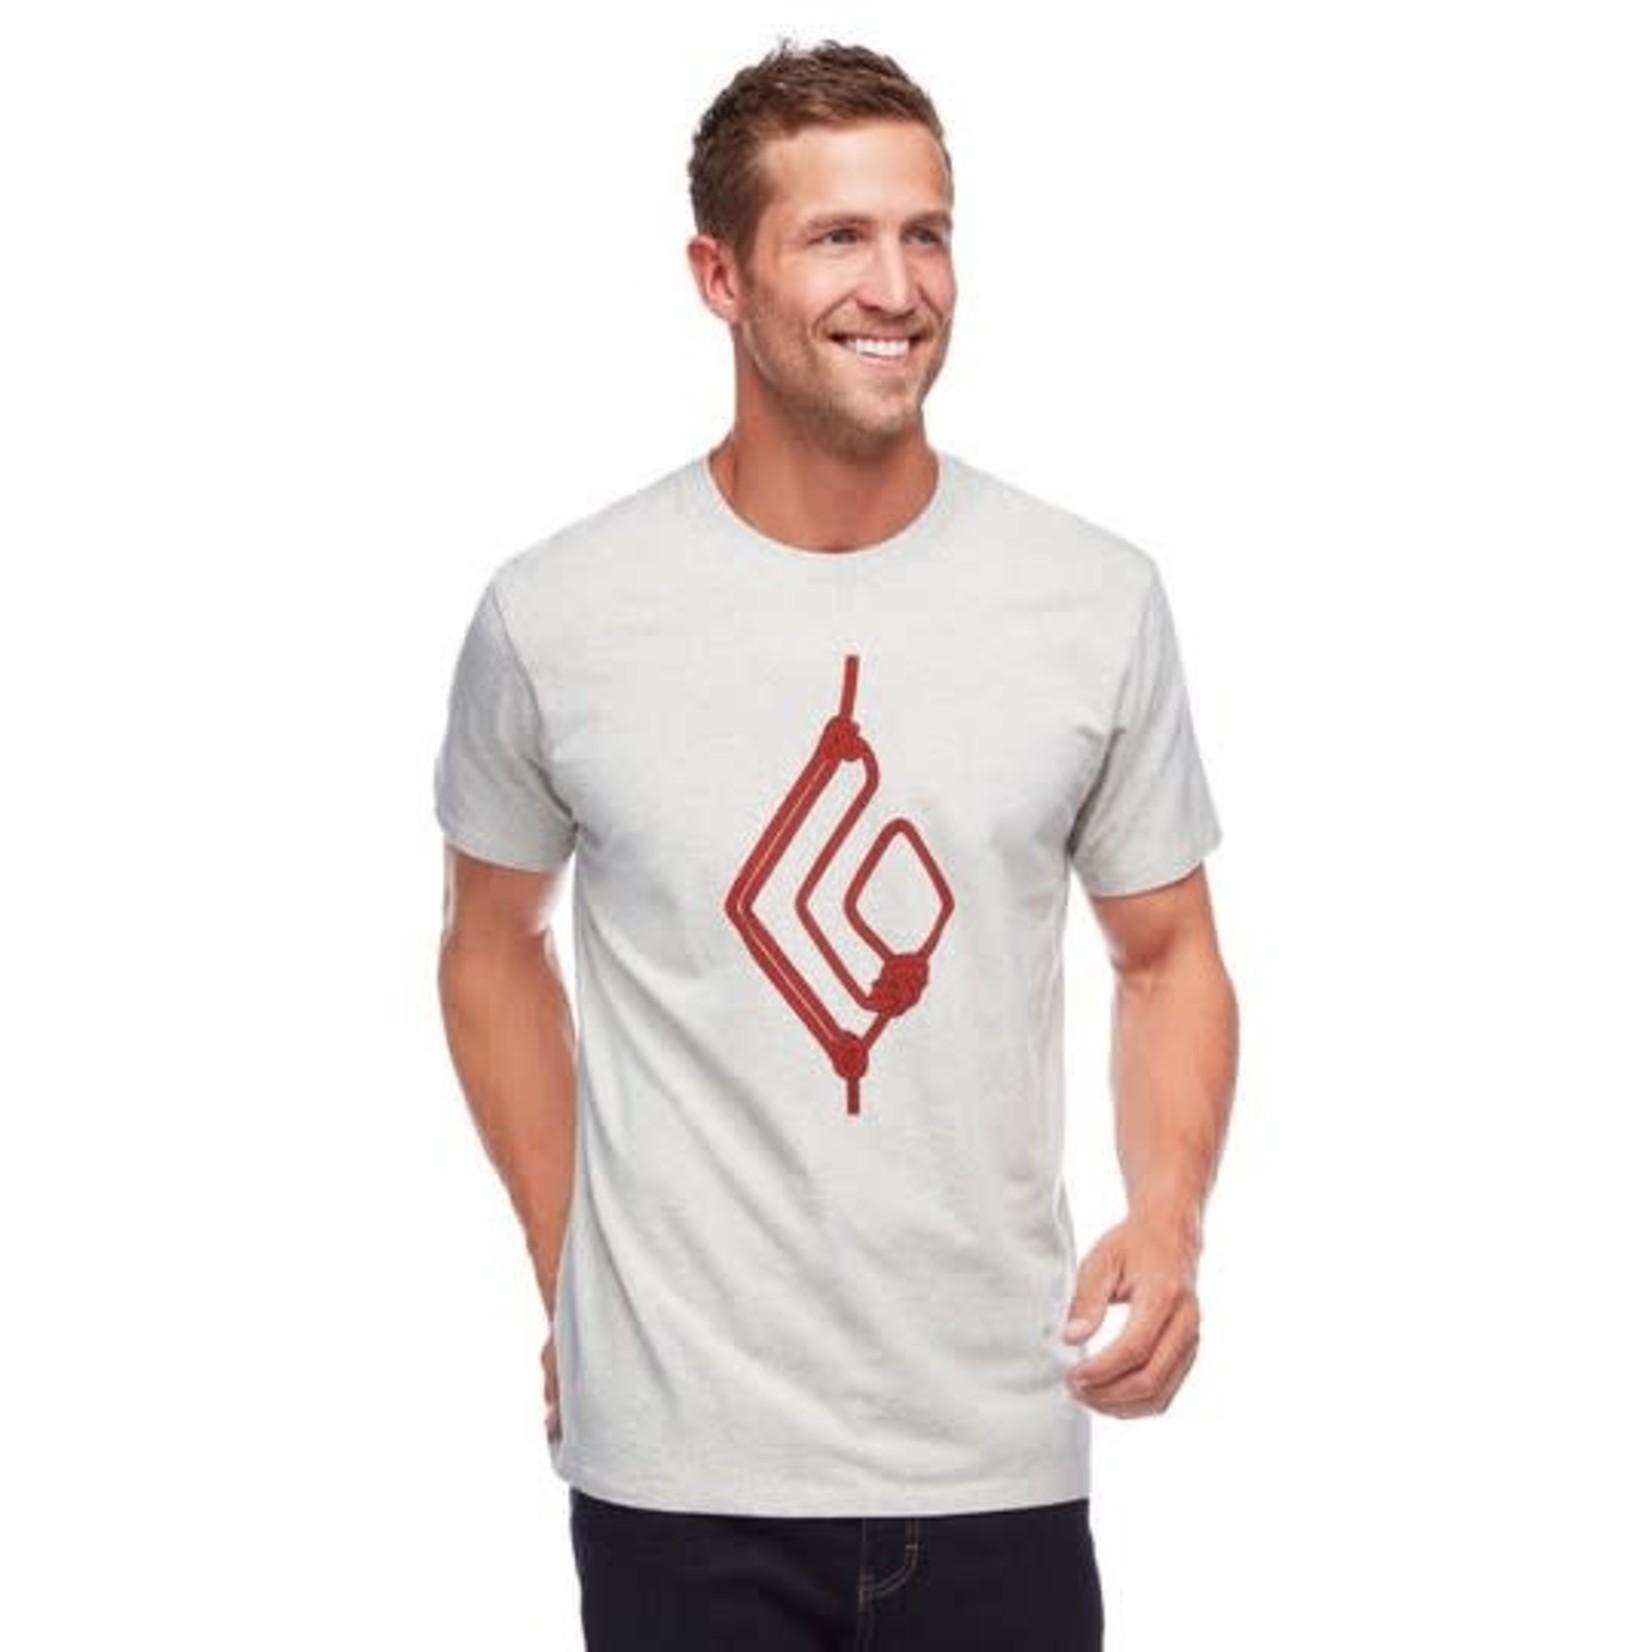 Black Diamond T-shirt Black Diamond Rope Diamond - Homme